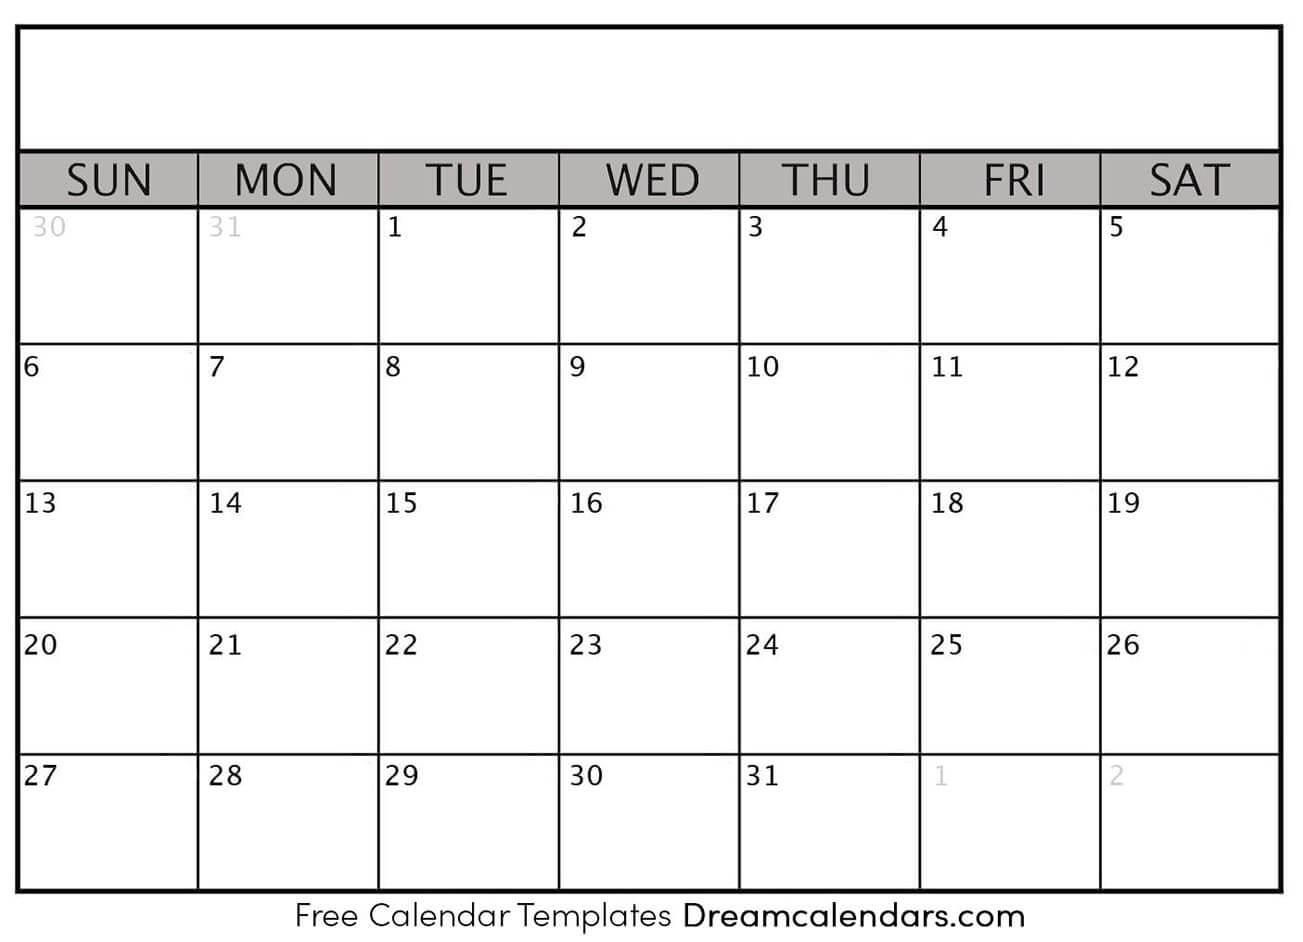 Printable Blank Calendar 2021 | Dream Calendars with regard to Free Fill In Printable Calendars